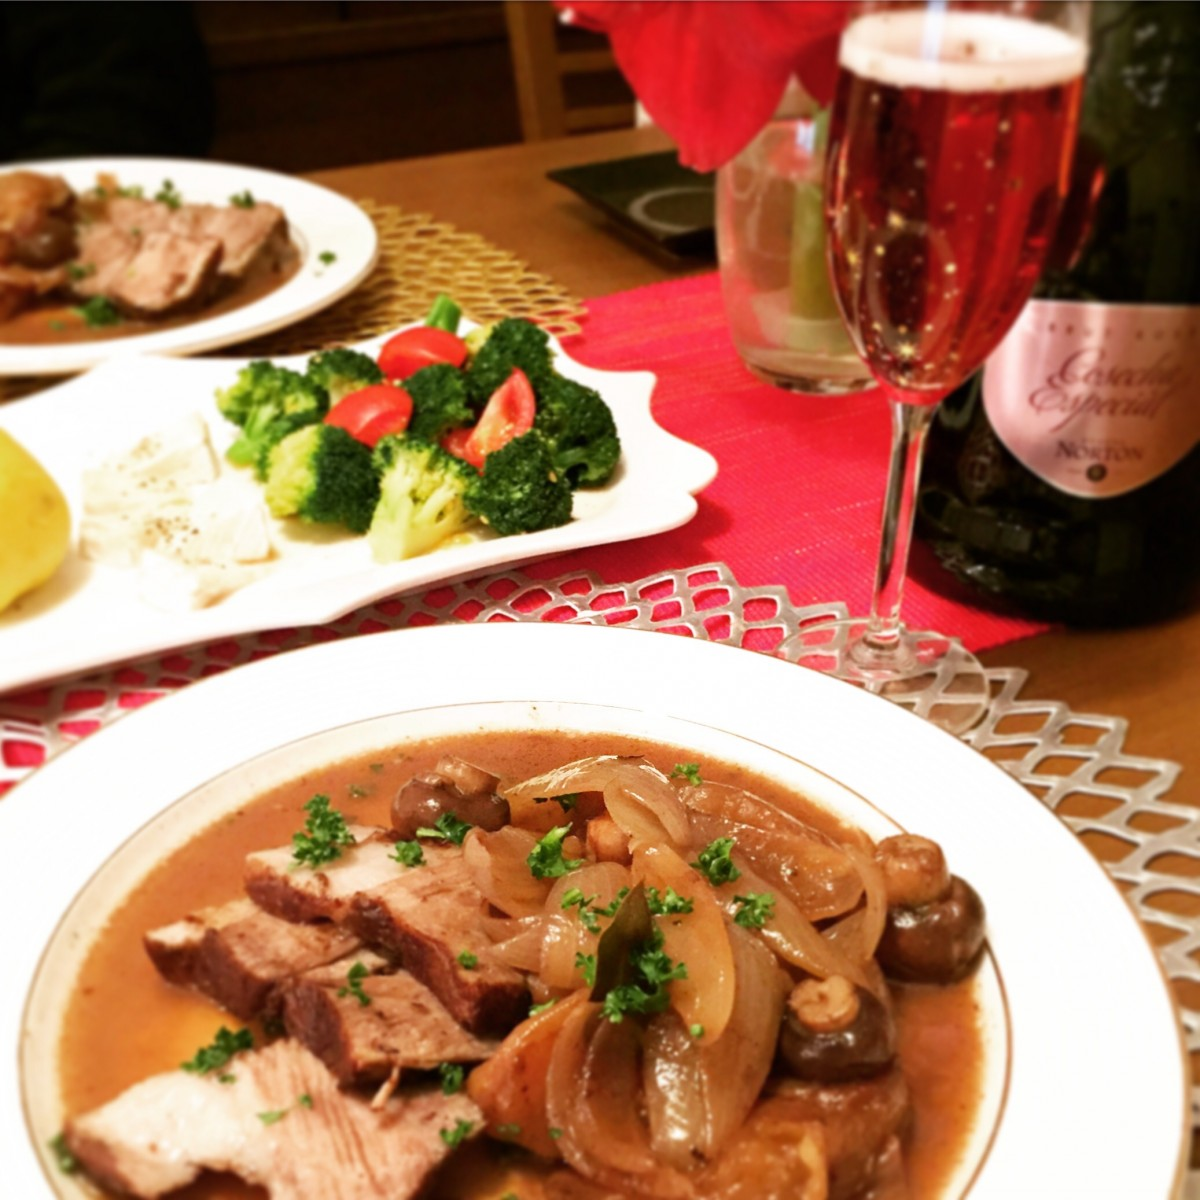 MAQUIA2月号掲載♡クリスマスディナーにおすすめレシピ!